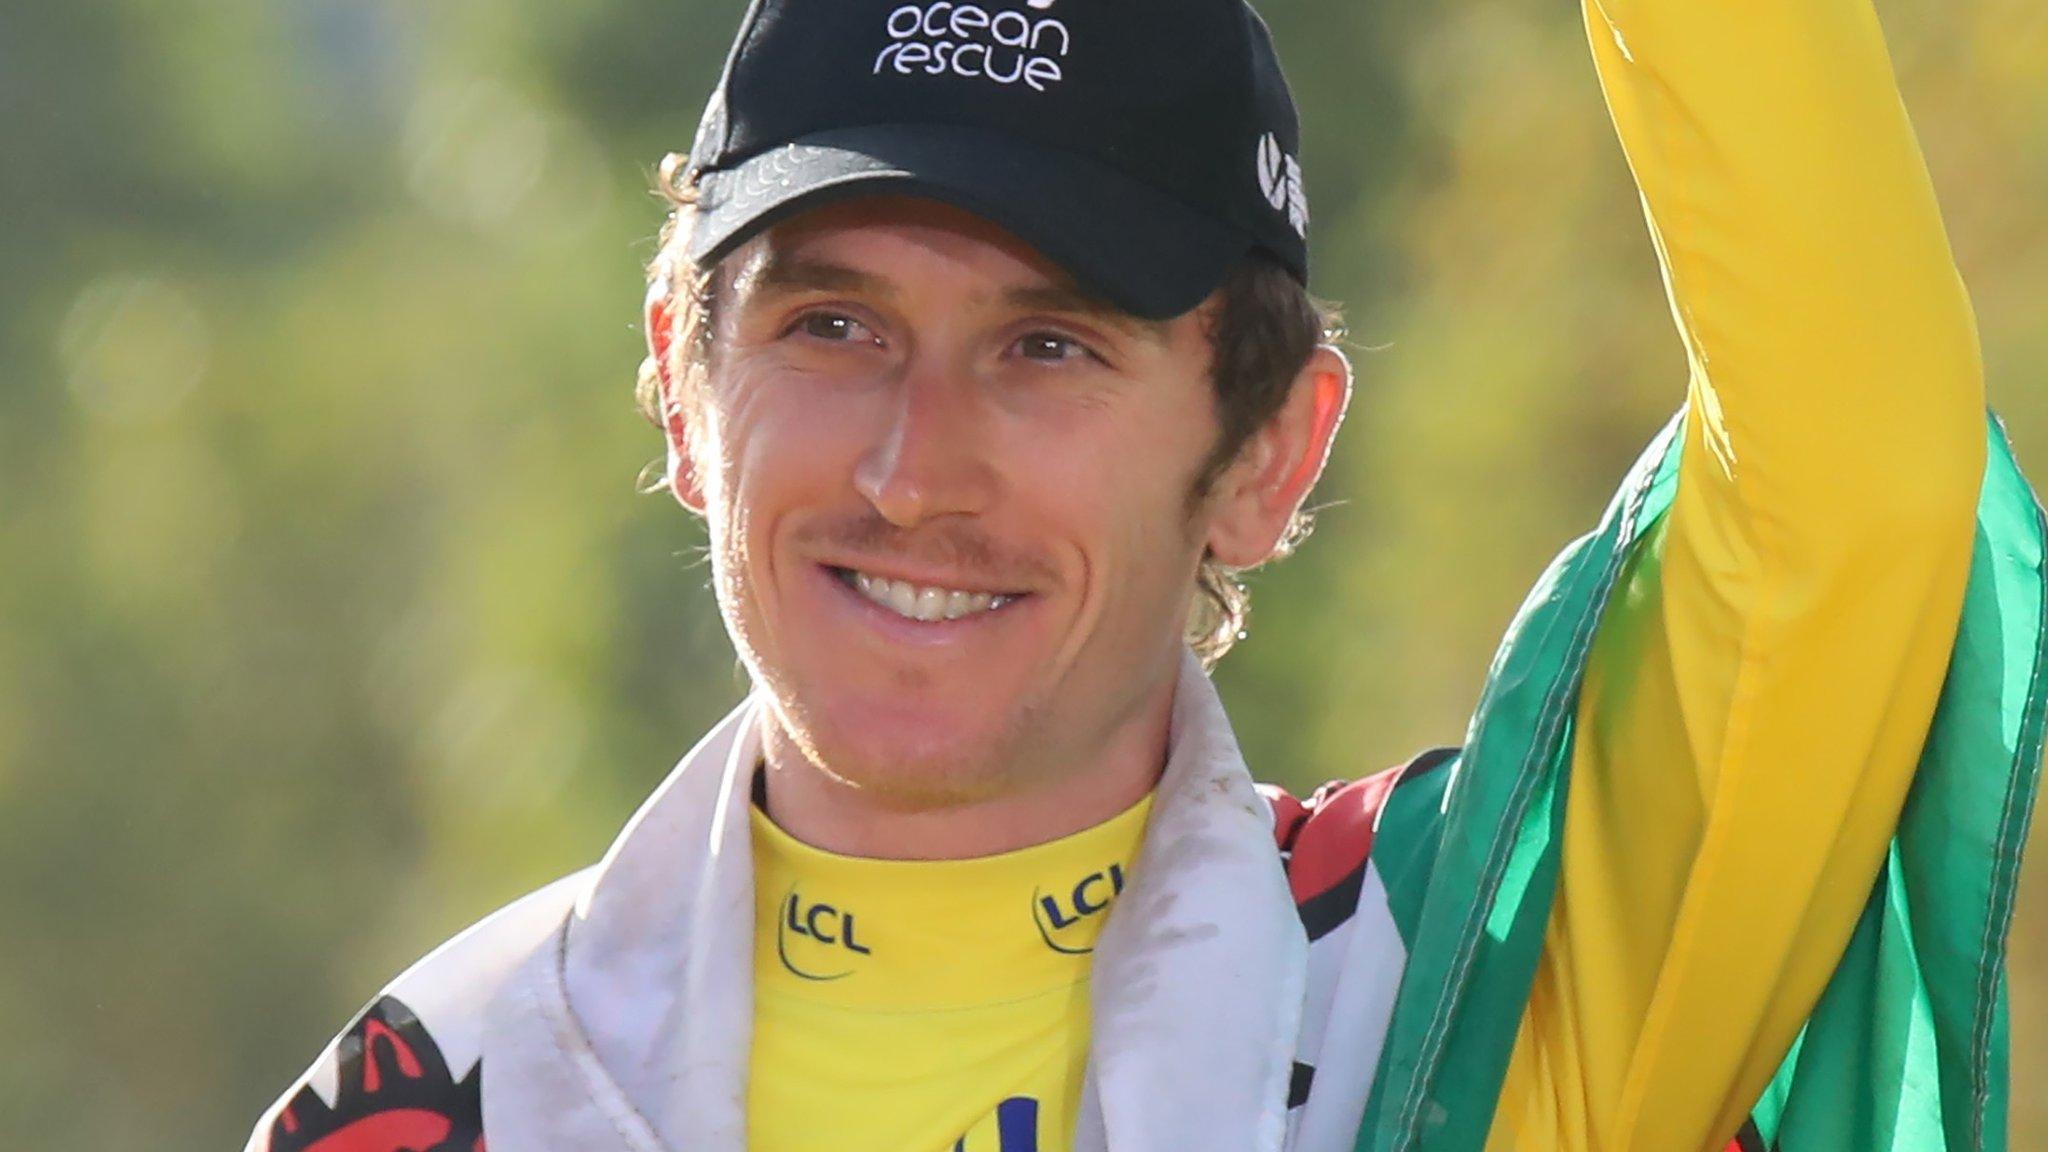 Geraint Thomas: Tour de France champion's long road back to normality